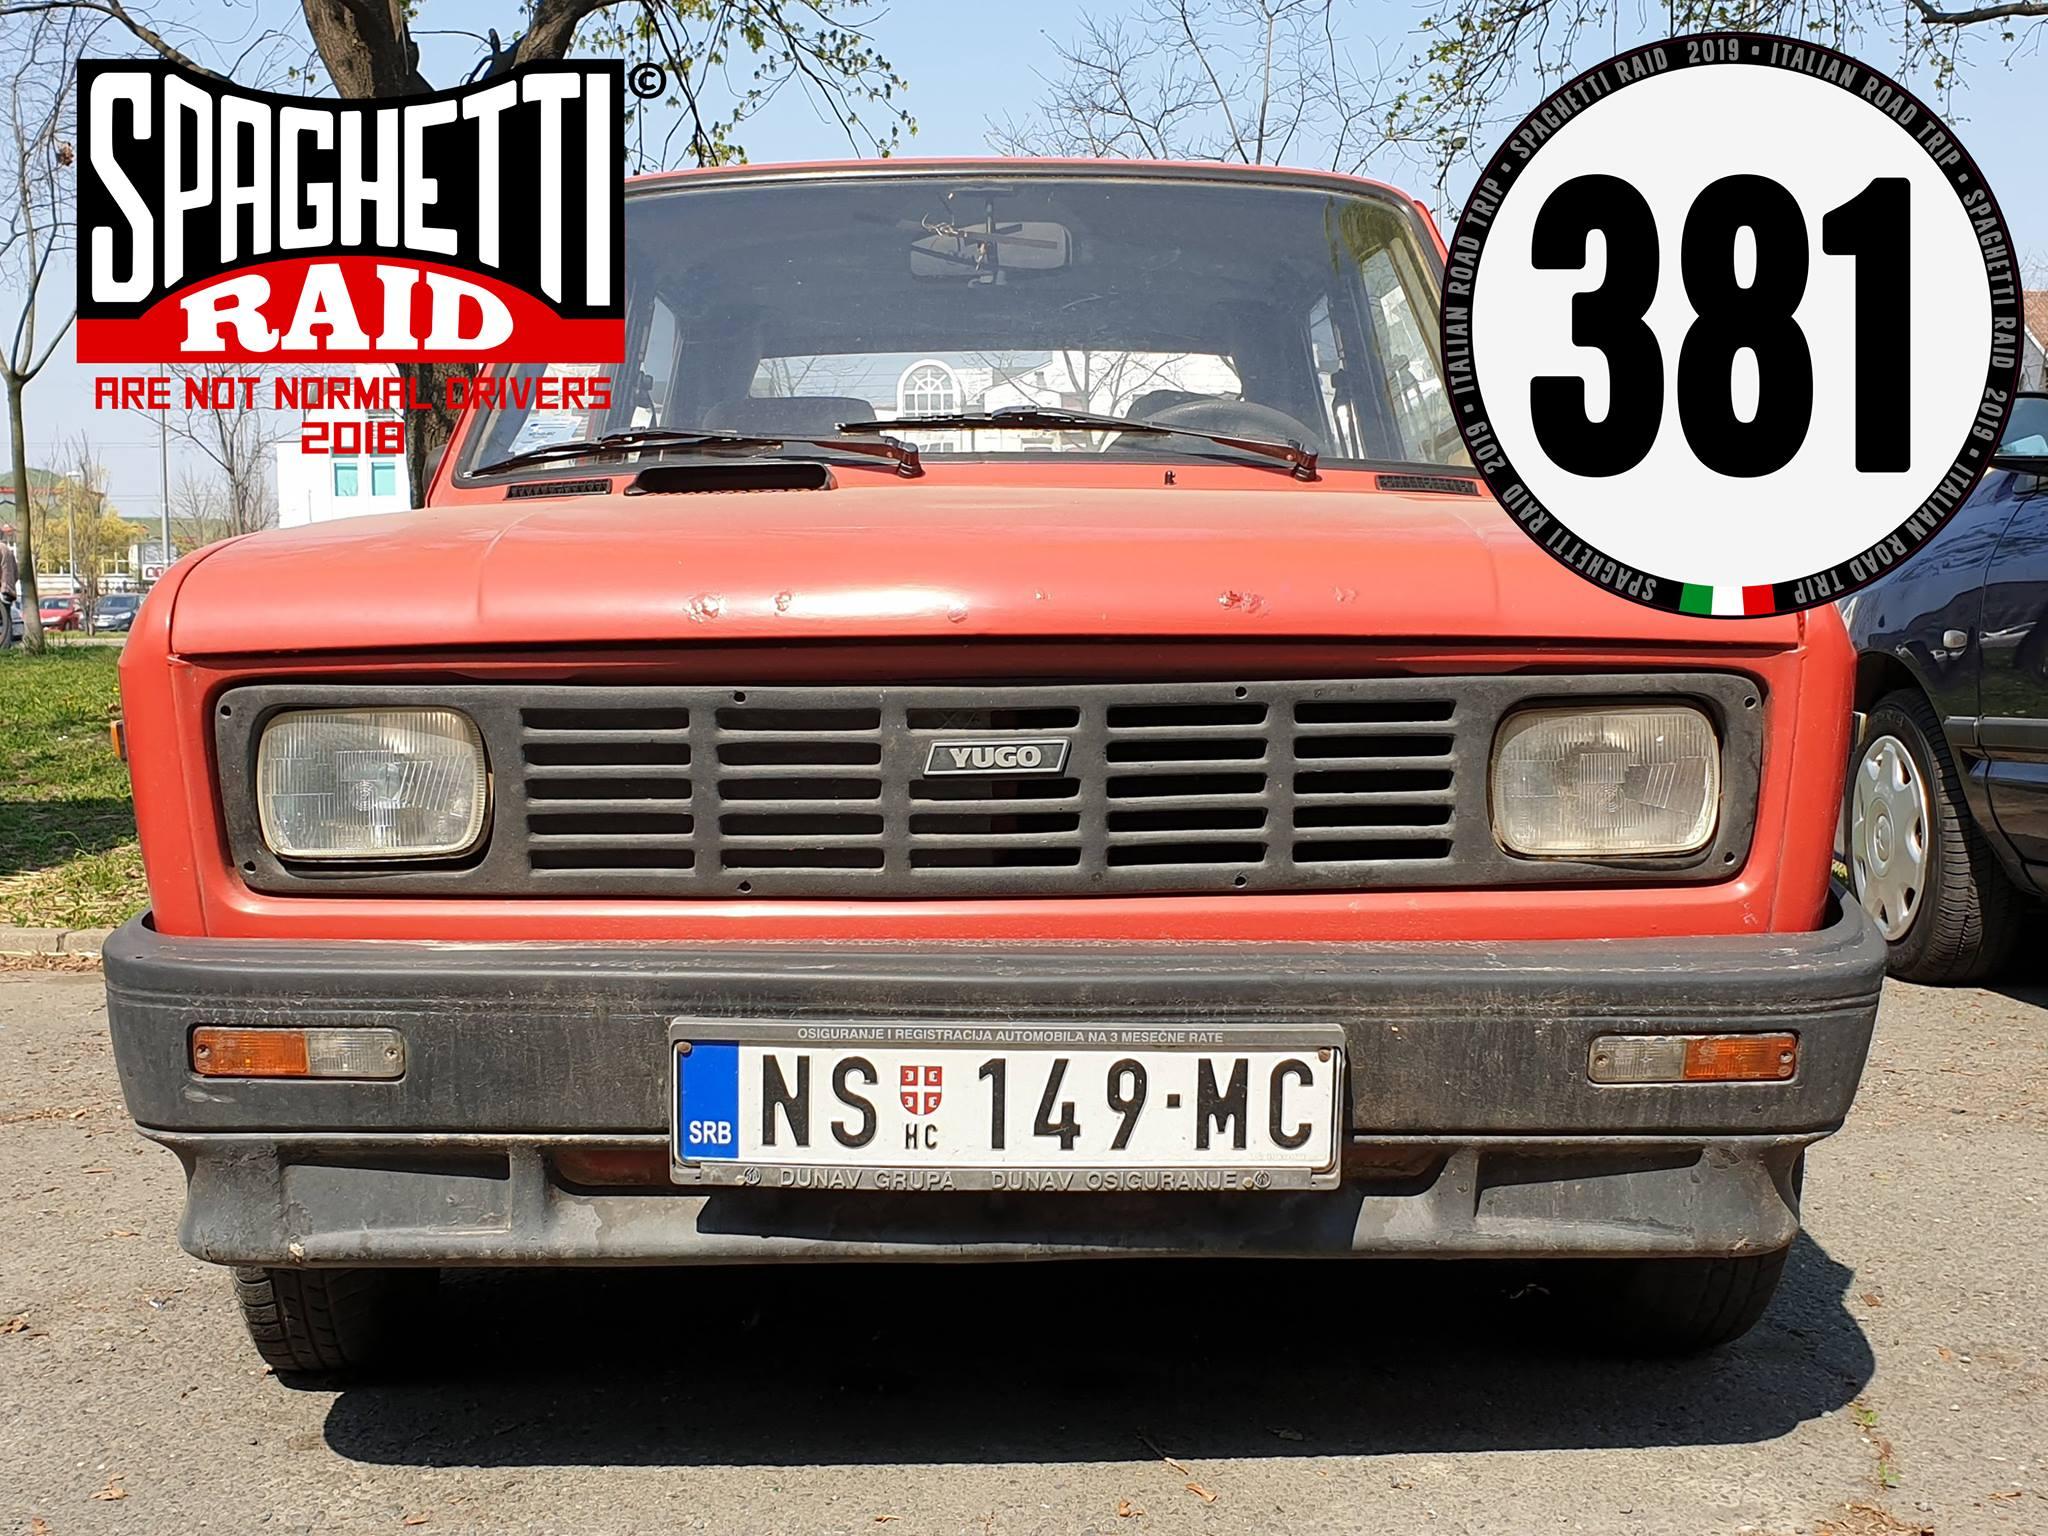 Team BALKAN #381 ZASTAVA 101 1100cc del '86 Città: Novi Sad - SERBIA